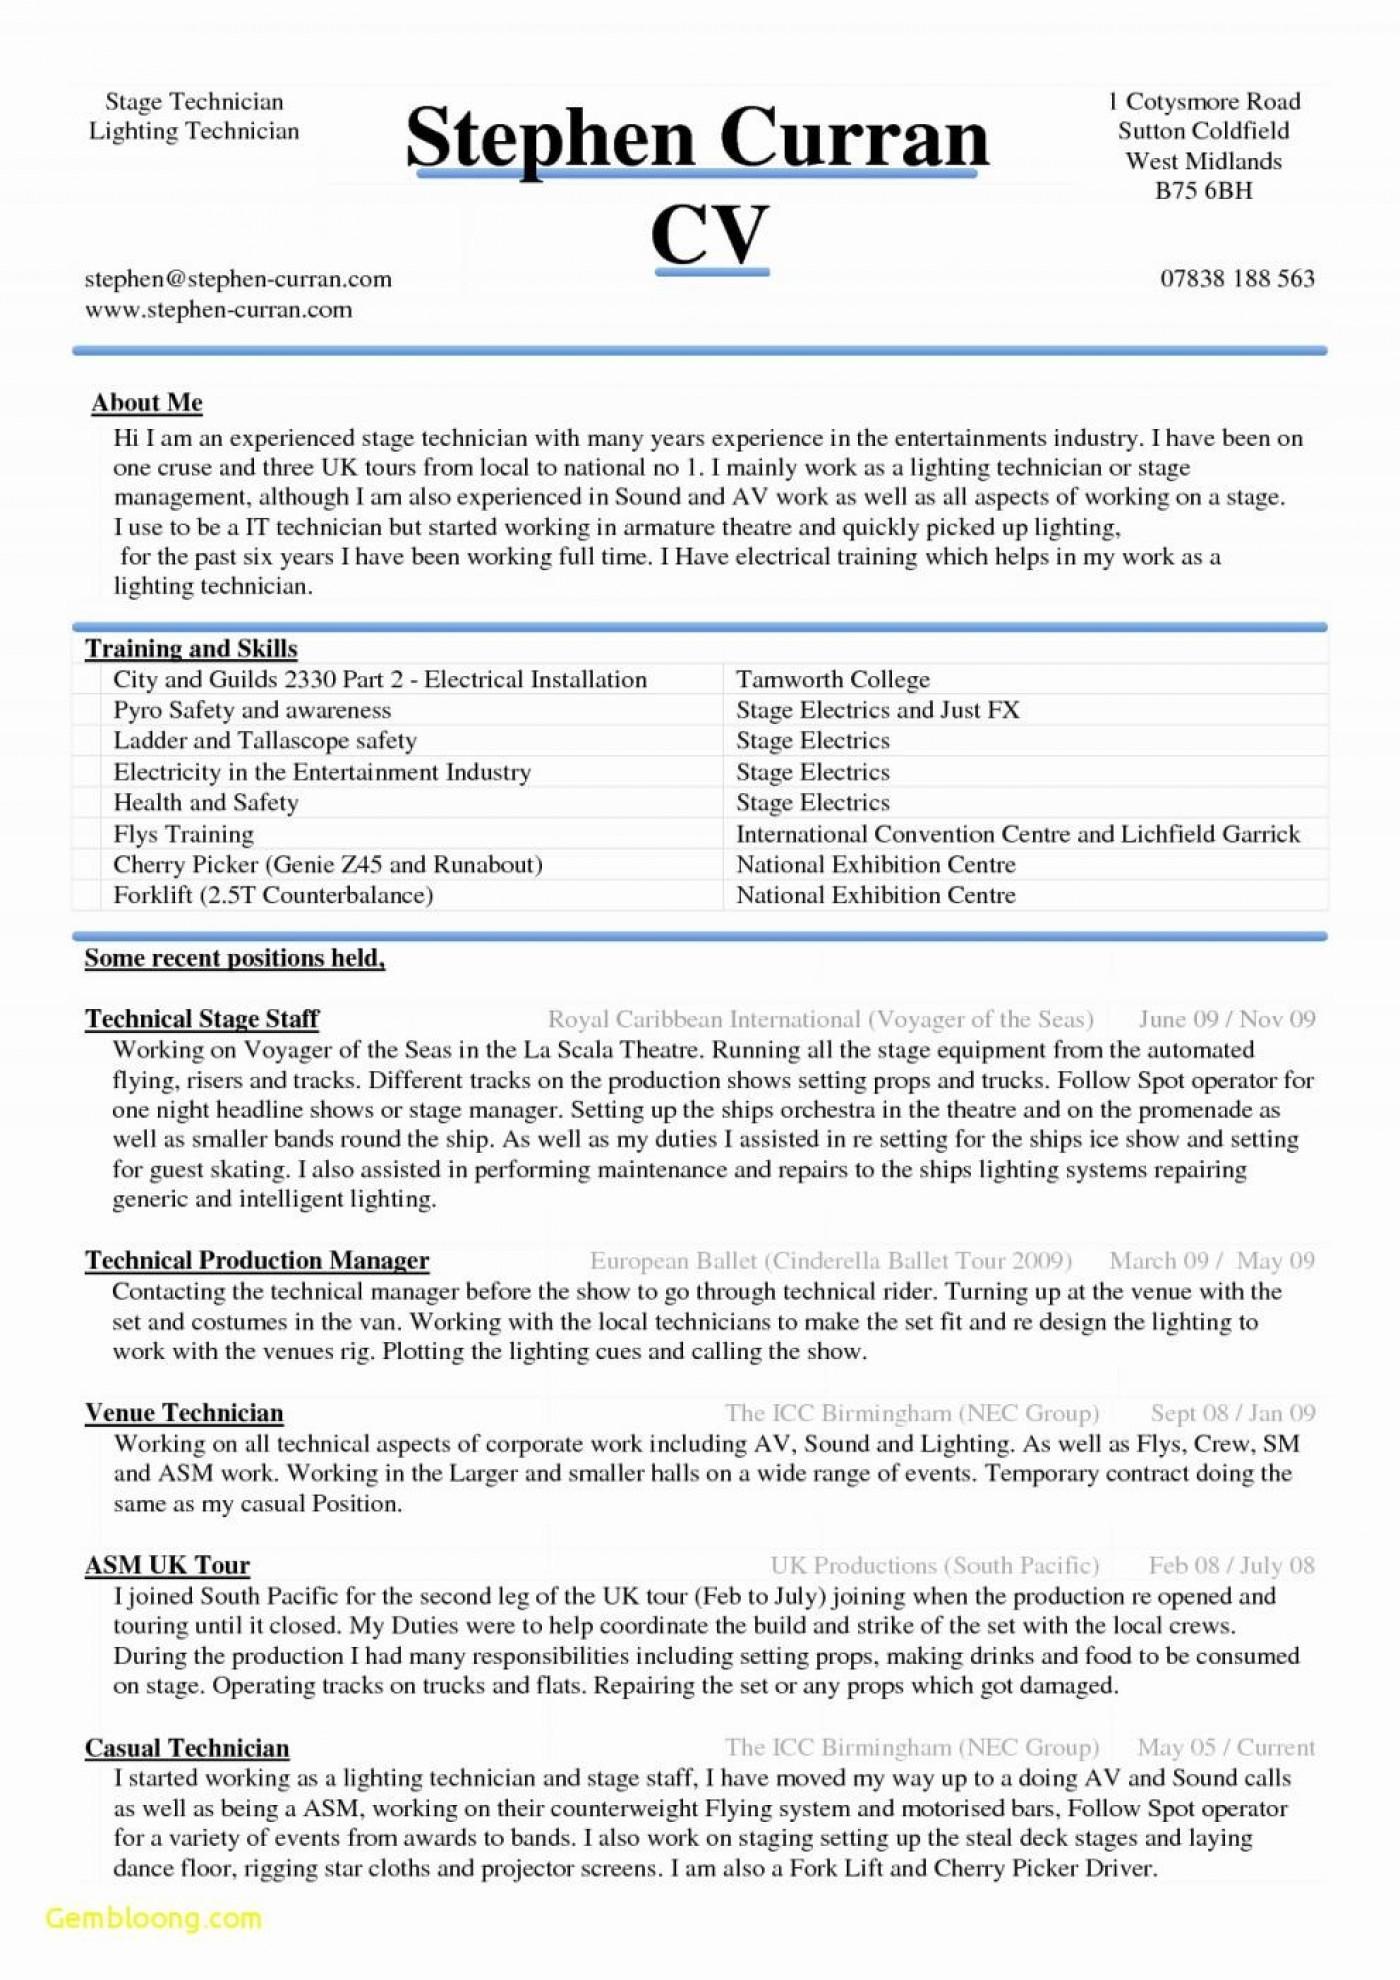 Resume Template For Wordpad Topa Mastersathletics Co